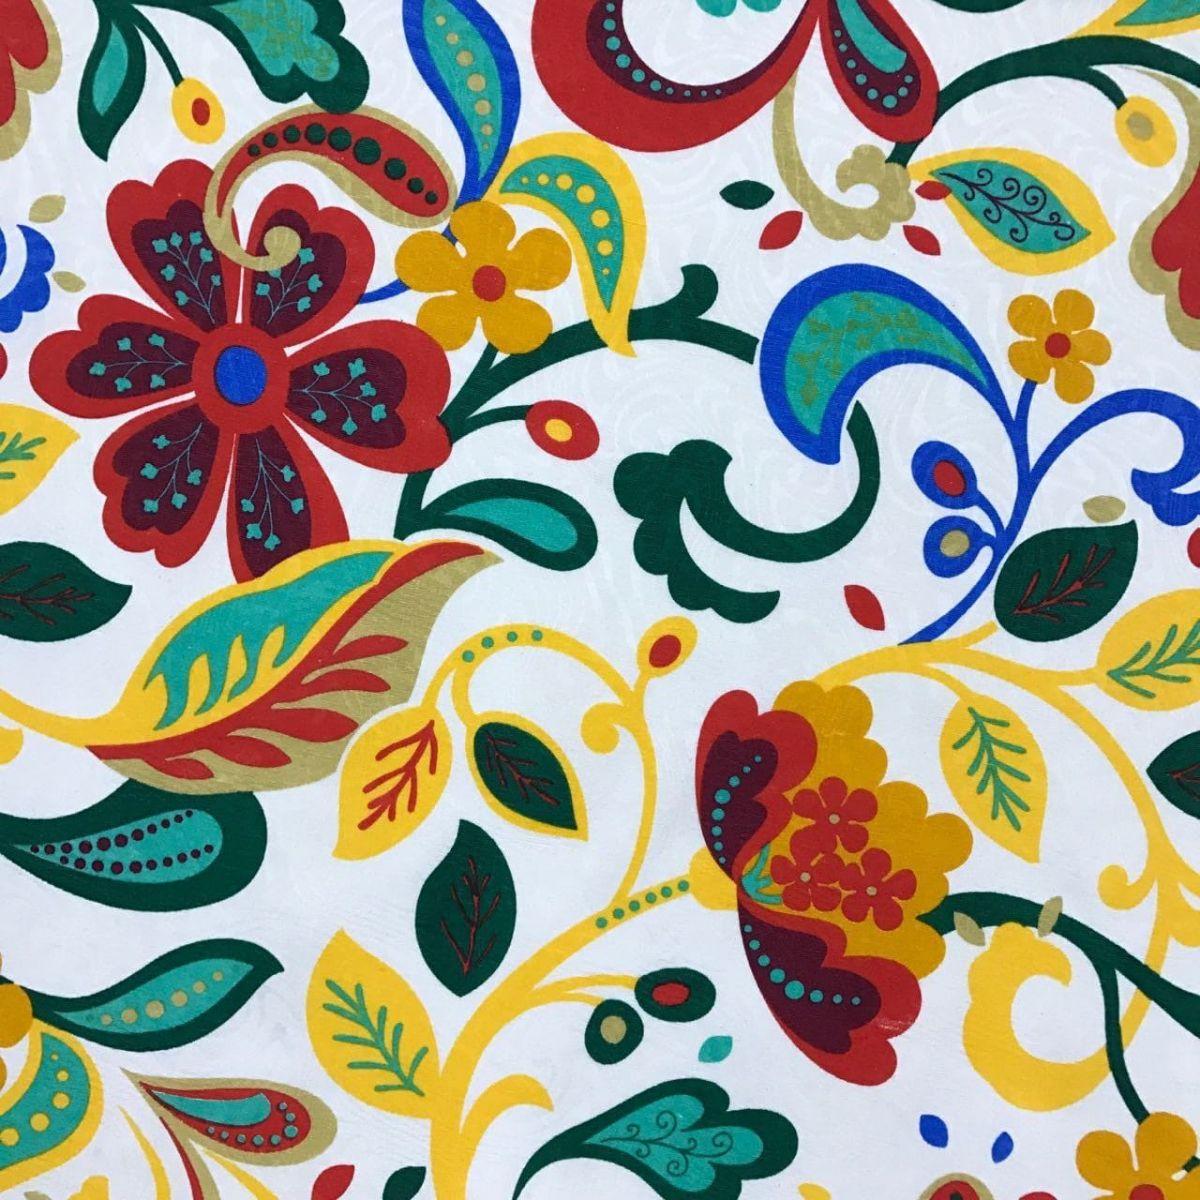 Tecido Jacquard Estampado Floral Color - 1.40m de Largura